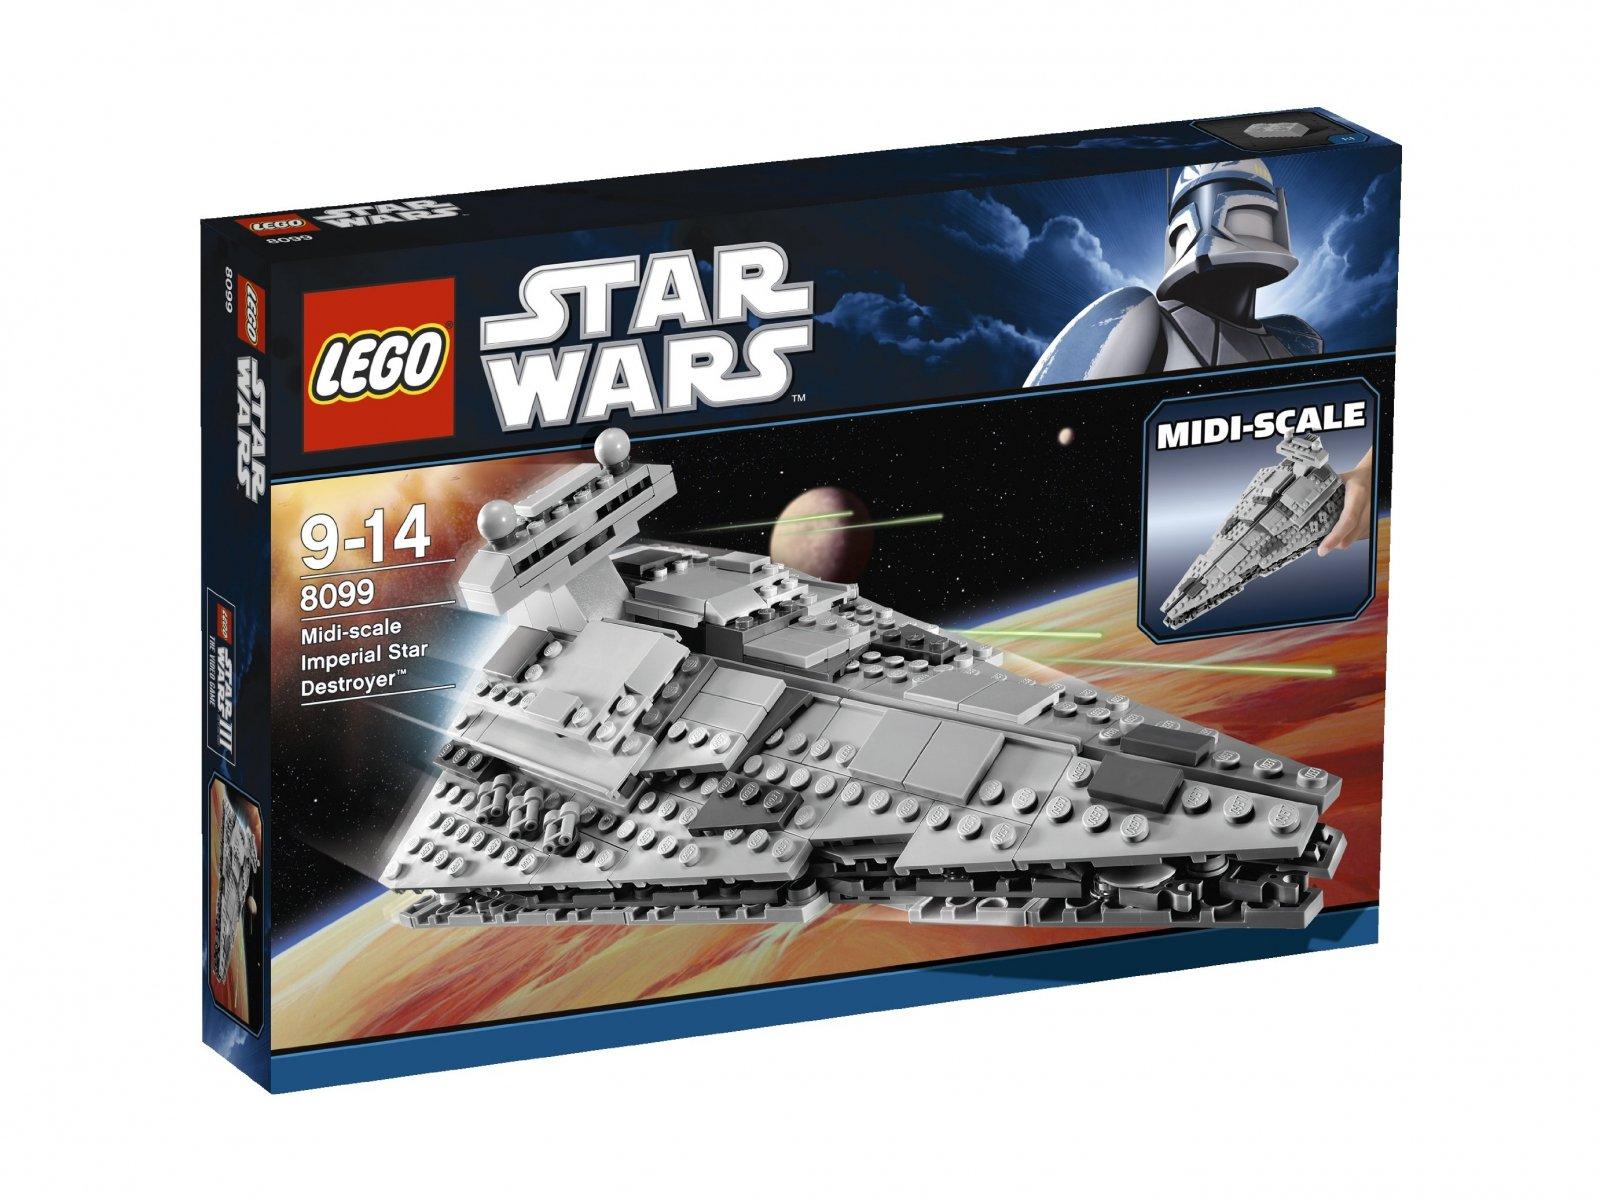 LEGO 8099 Midi-scale Imperial Star Destroyer™